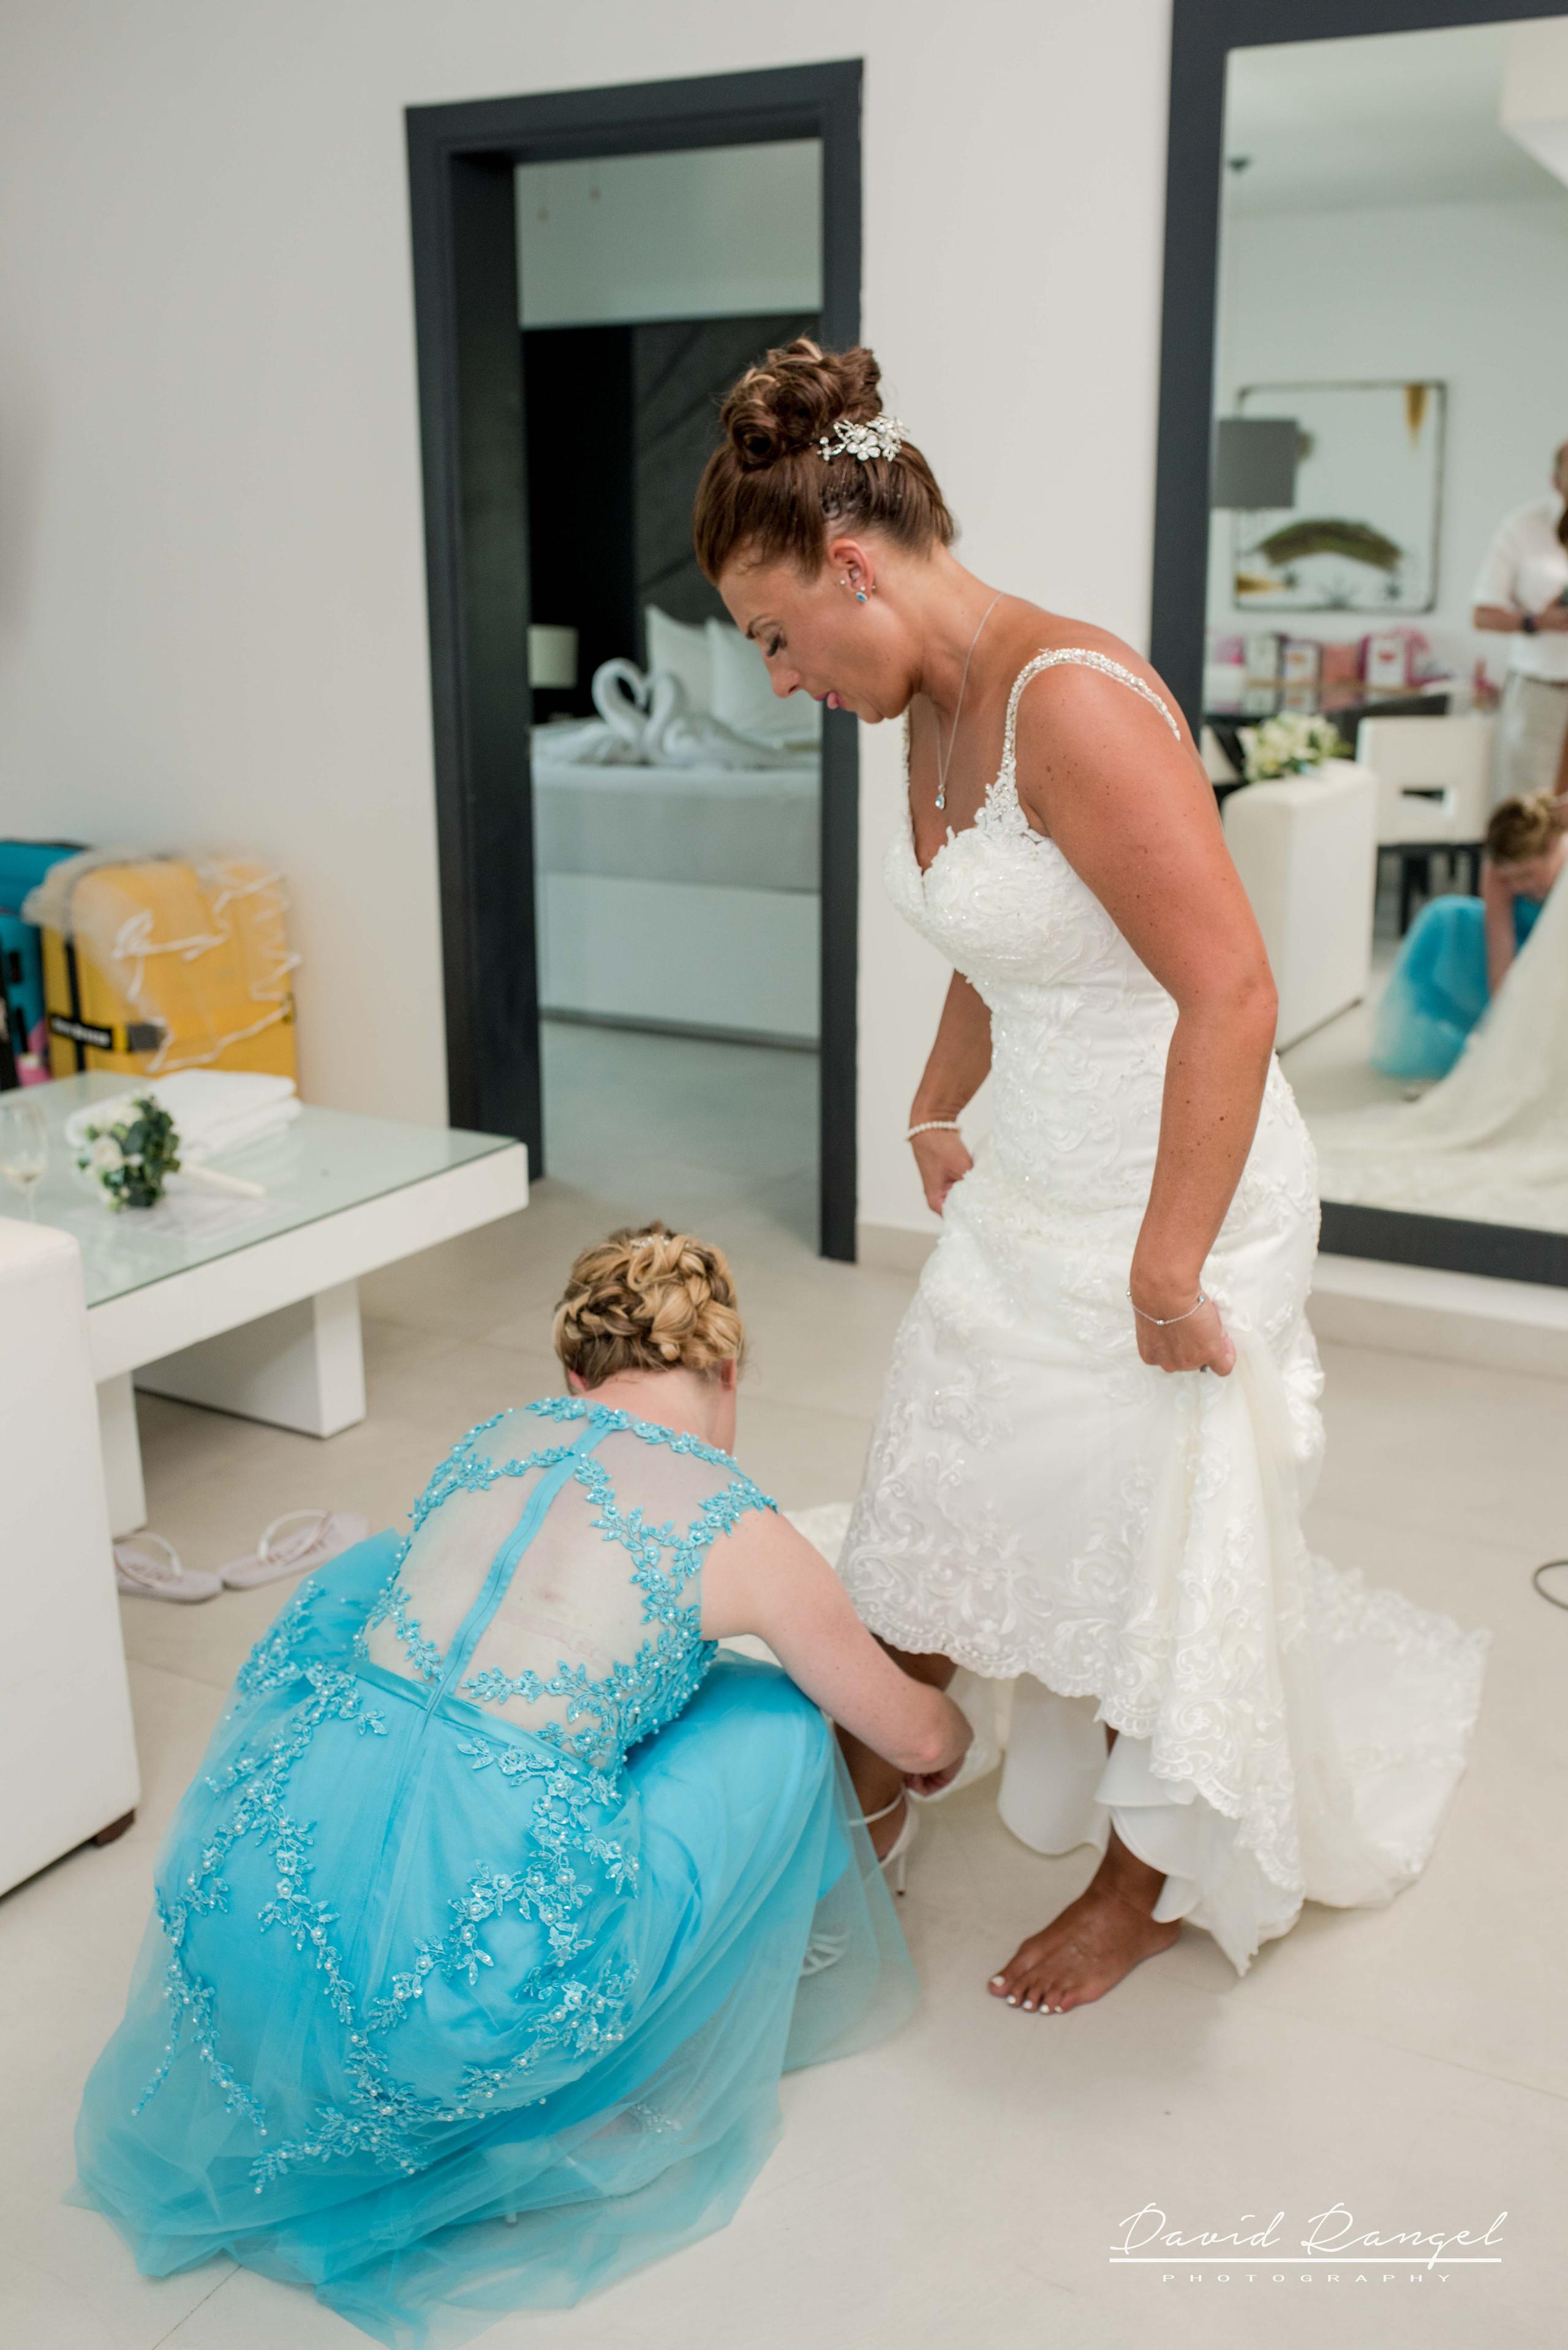 bride+getting+ready+photo+azul+beach